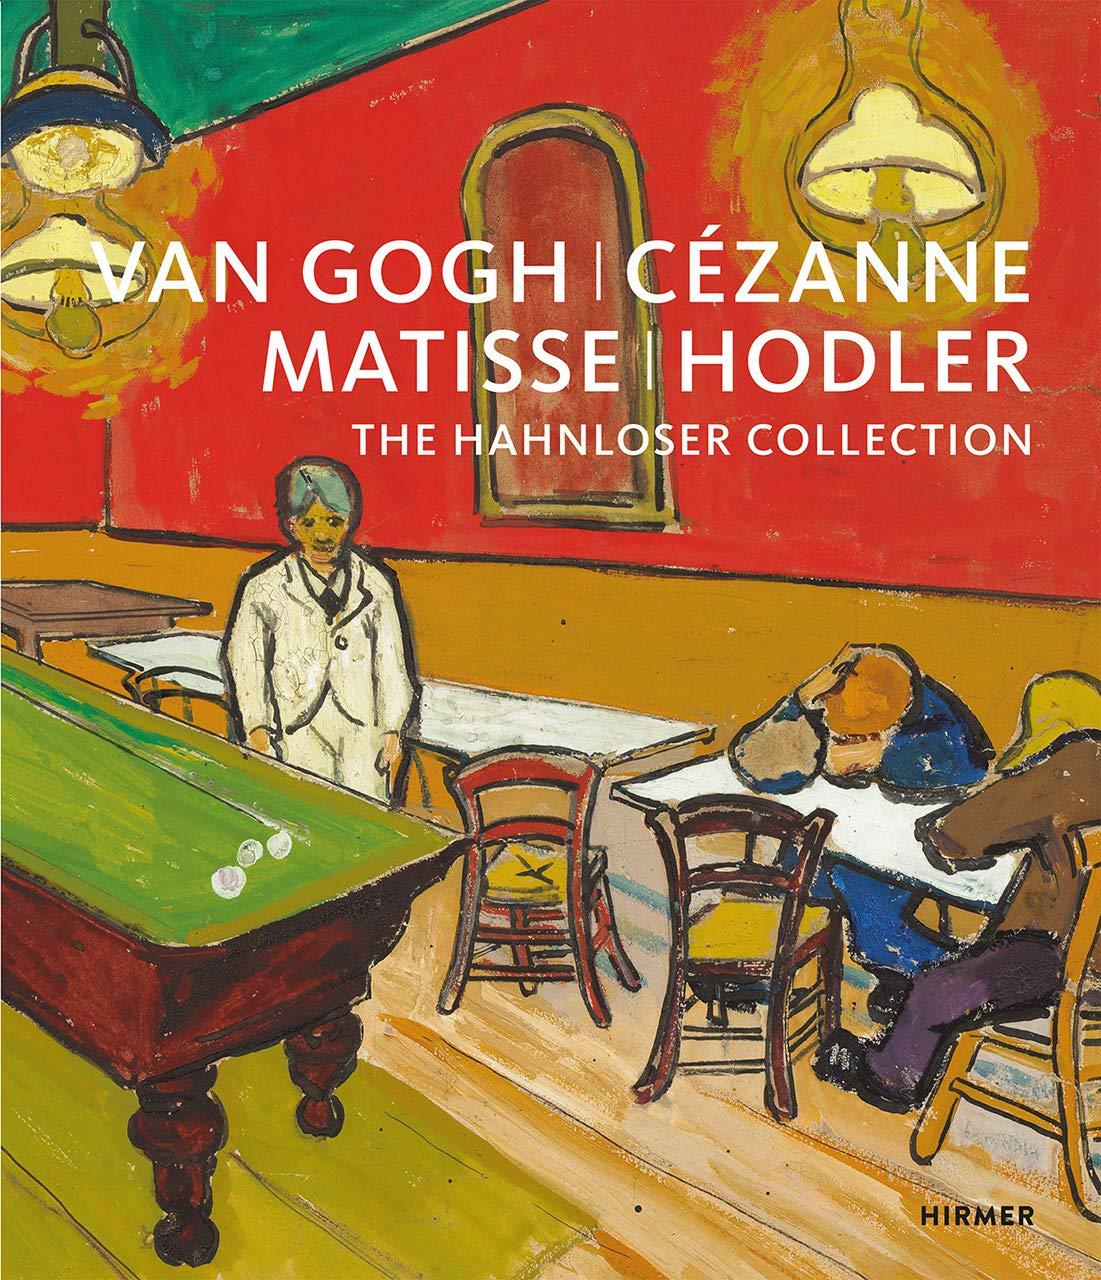 Van Gogh, Cézanne, Matisse, Hodler: The Hahnloser Collection: Amazon.es: Karl Albrecht Schröder, Matthias Frehner: Libros en idiomas extranjeros